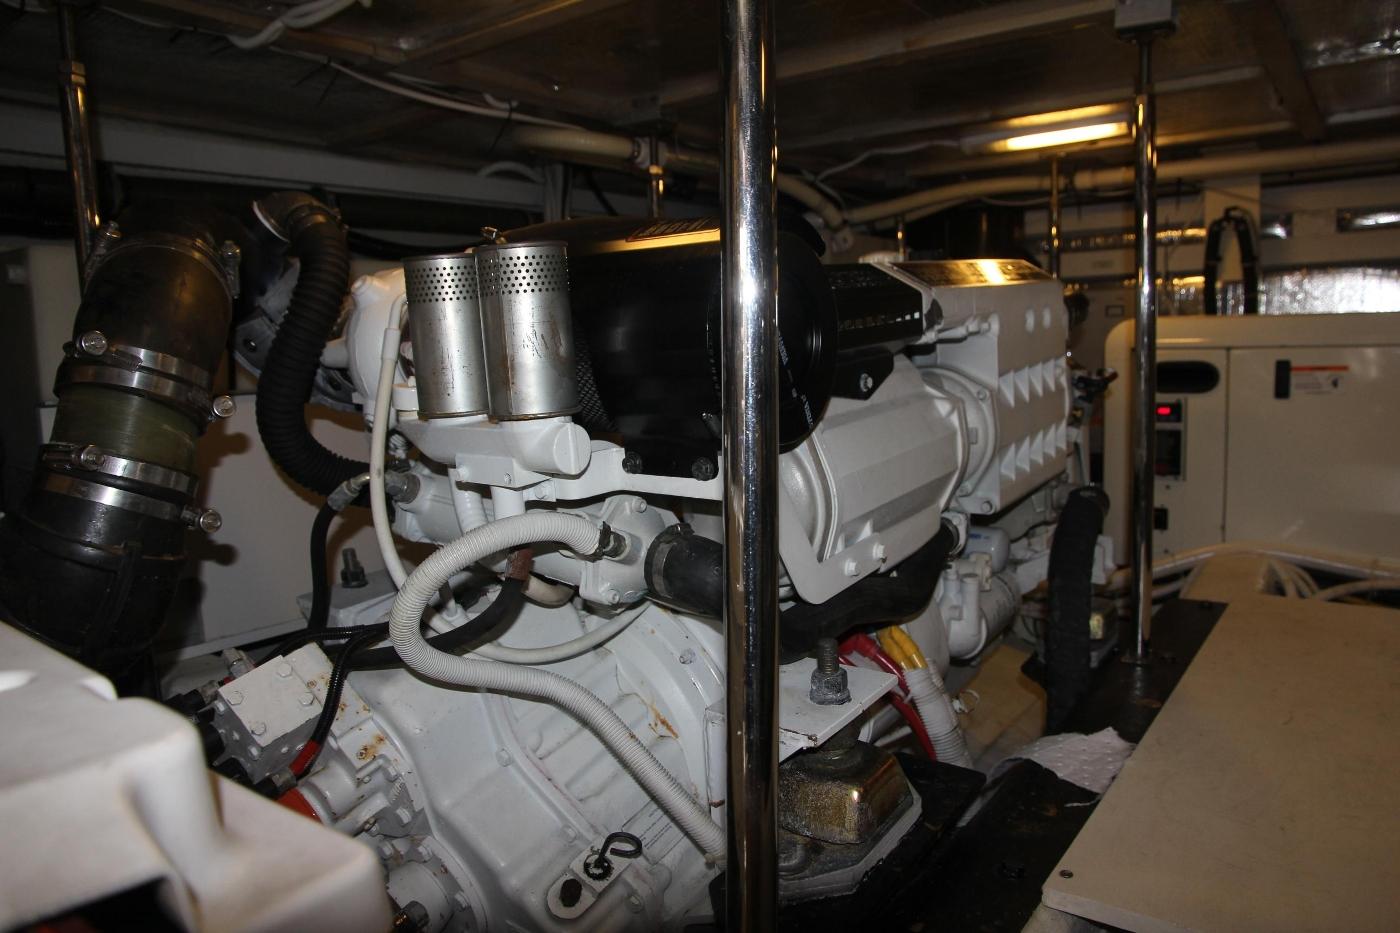 2005 Carver 560 Voyager Pilothouse, Port Engine